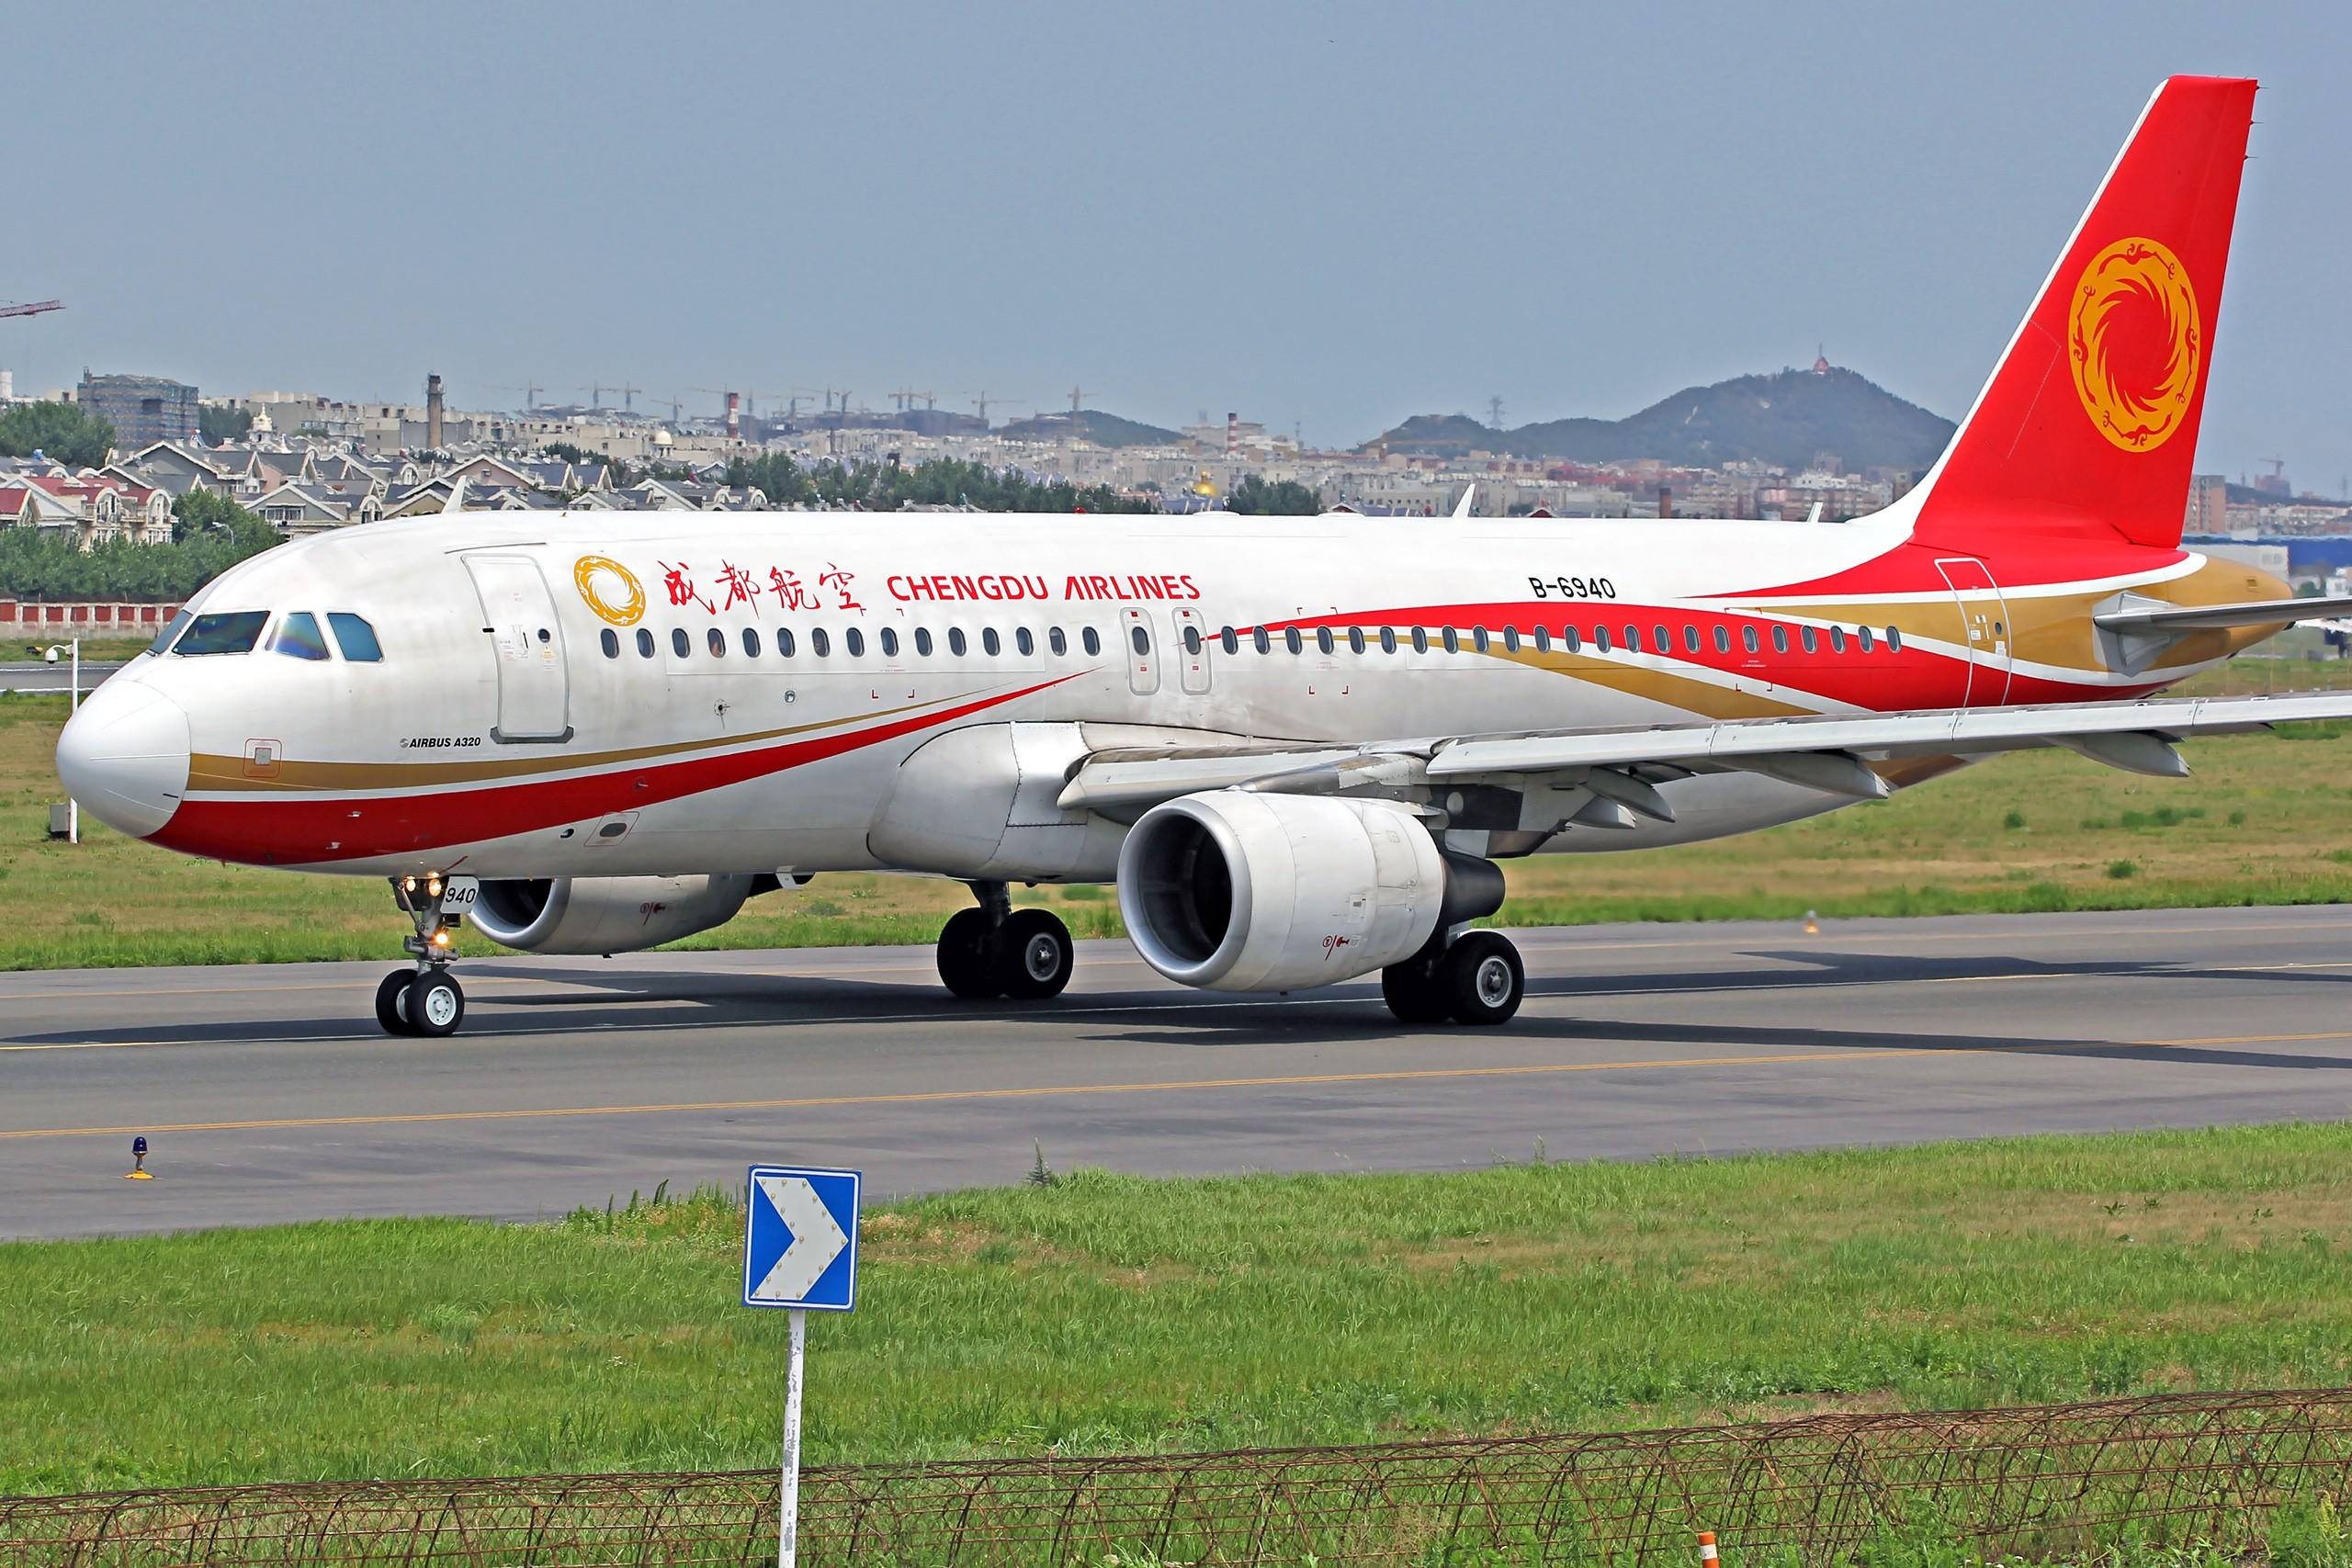 Re:[原创][DLC]...窄体机...2560x1707}Pix AIRBUS A320-200 B-6940 中国大连周水子国际机场